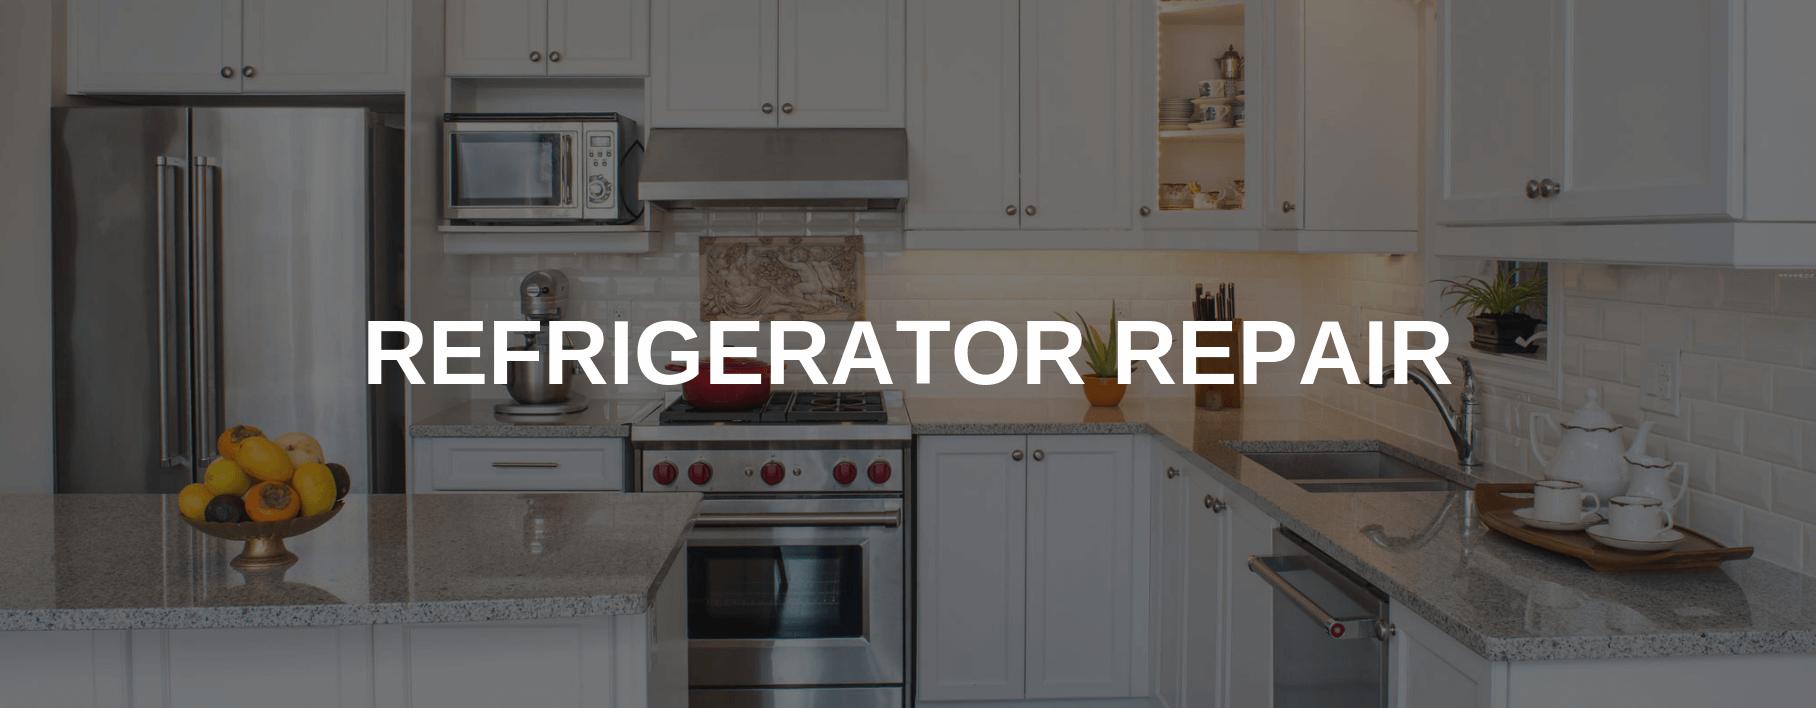 refrigerator repair vernon